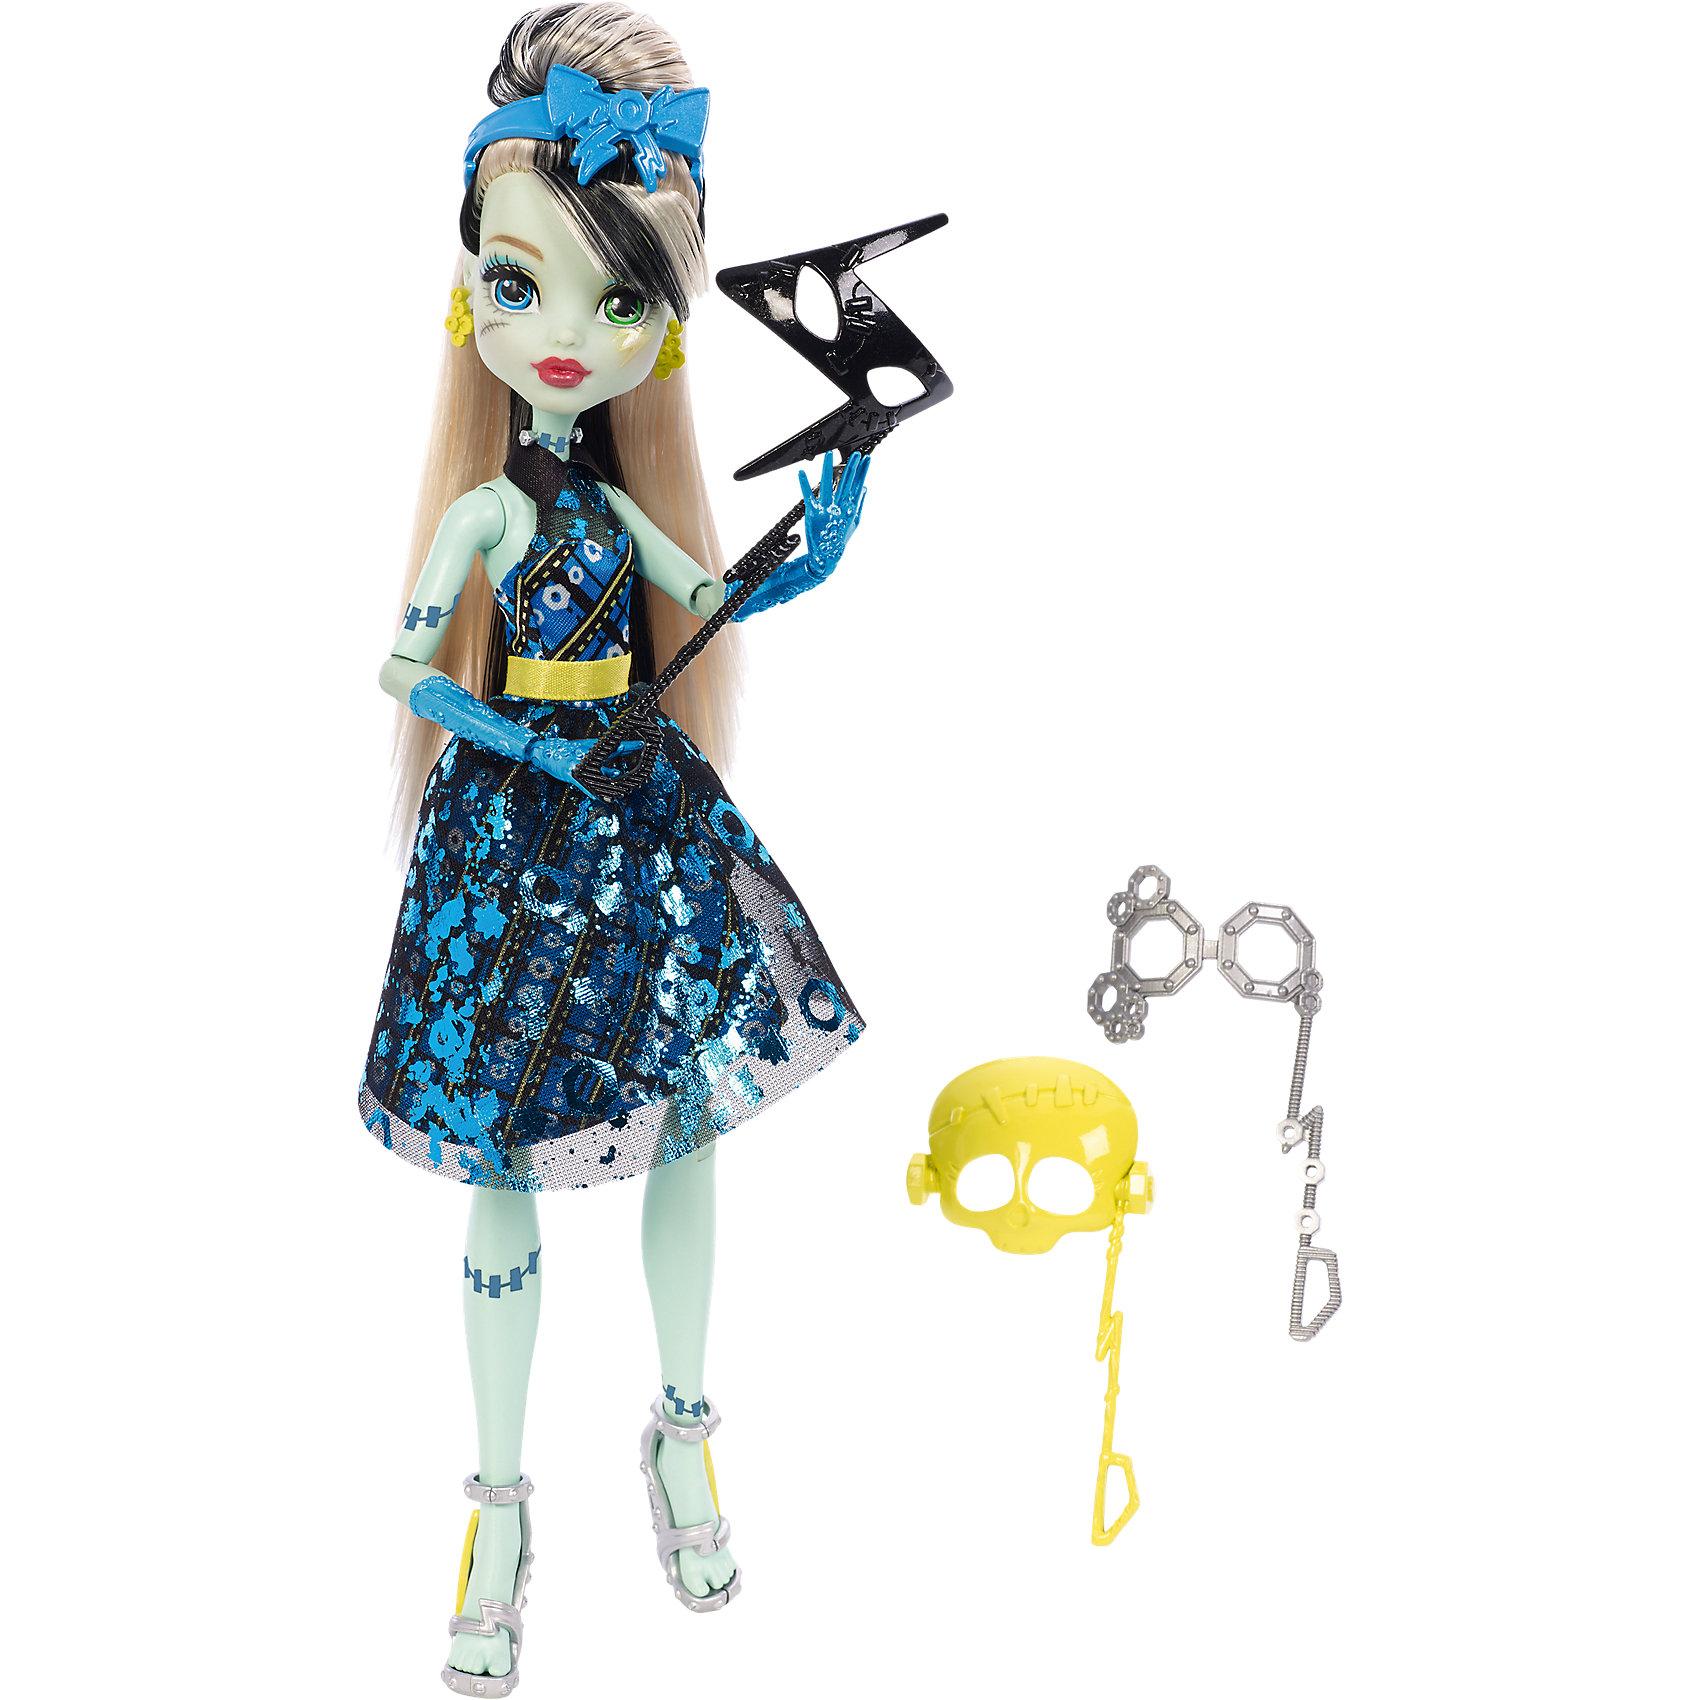 Mattel Кукла Фрэнки Штейн из серии Буникальные танцы с аксессуарами, Monster High mattel кукла фрэнки штейн в модном наряде monster high